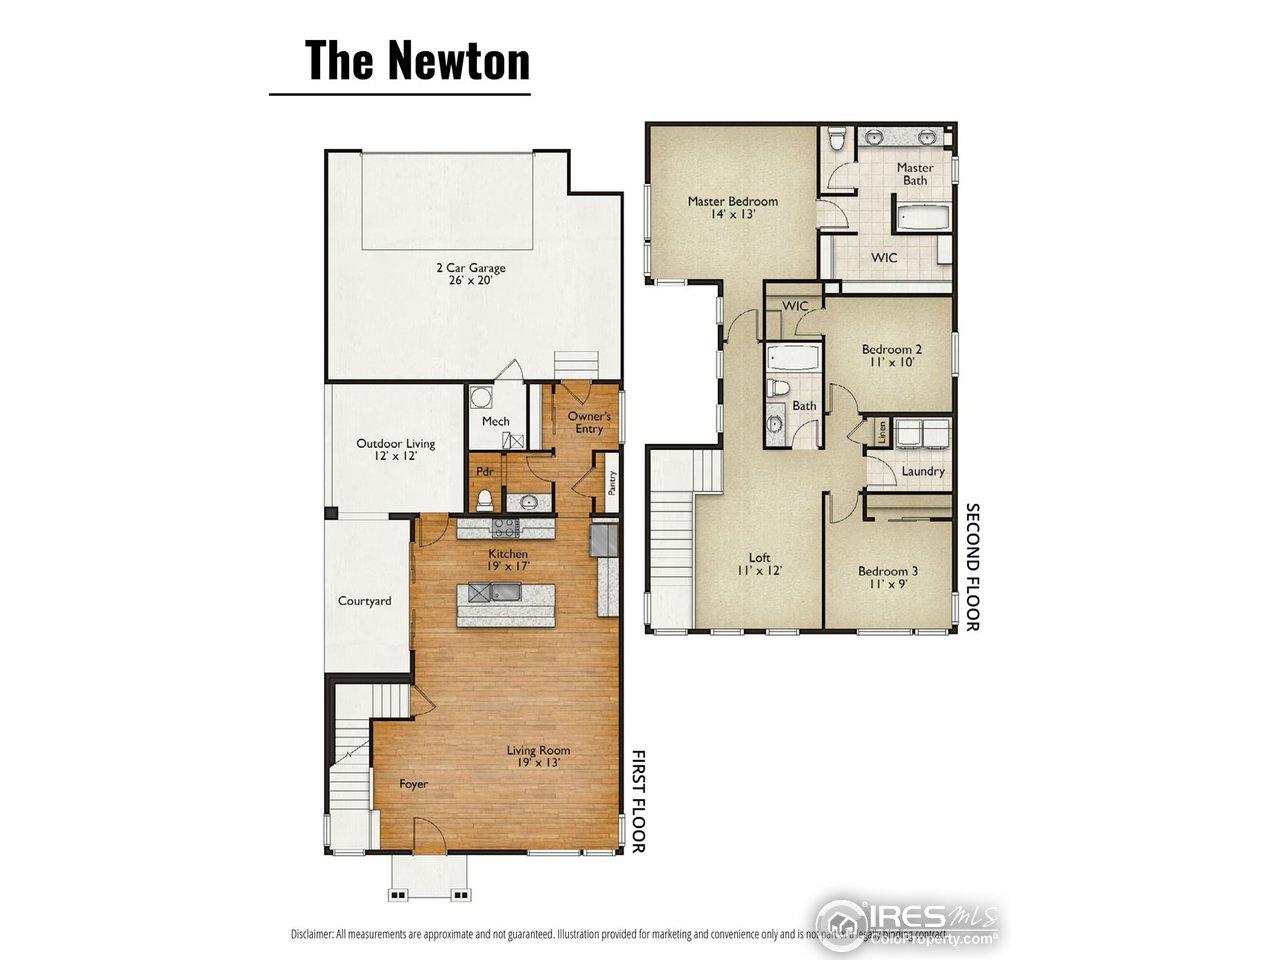 2981 SYKES DR, FORT COLLINS, CO 80524 | Kittle Real Estate